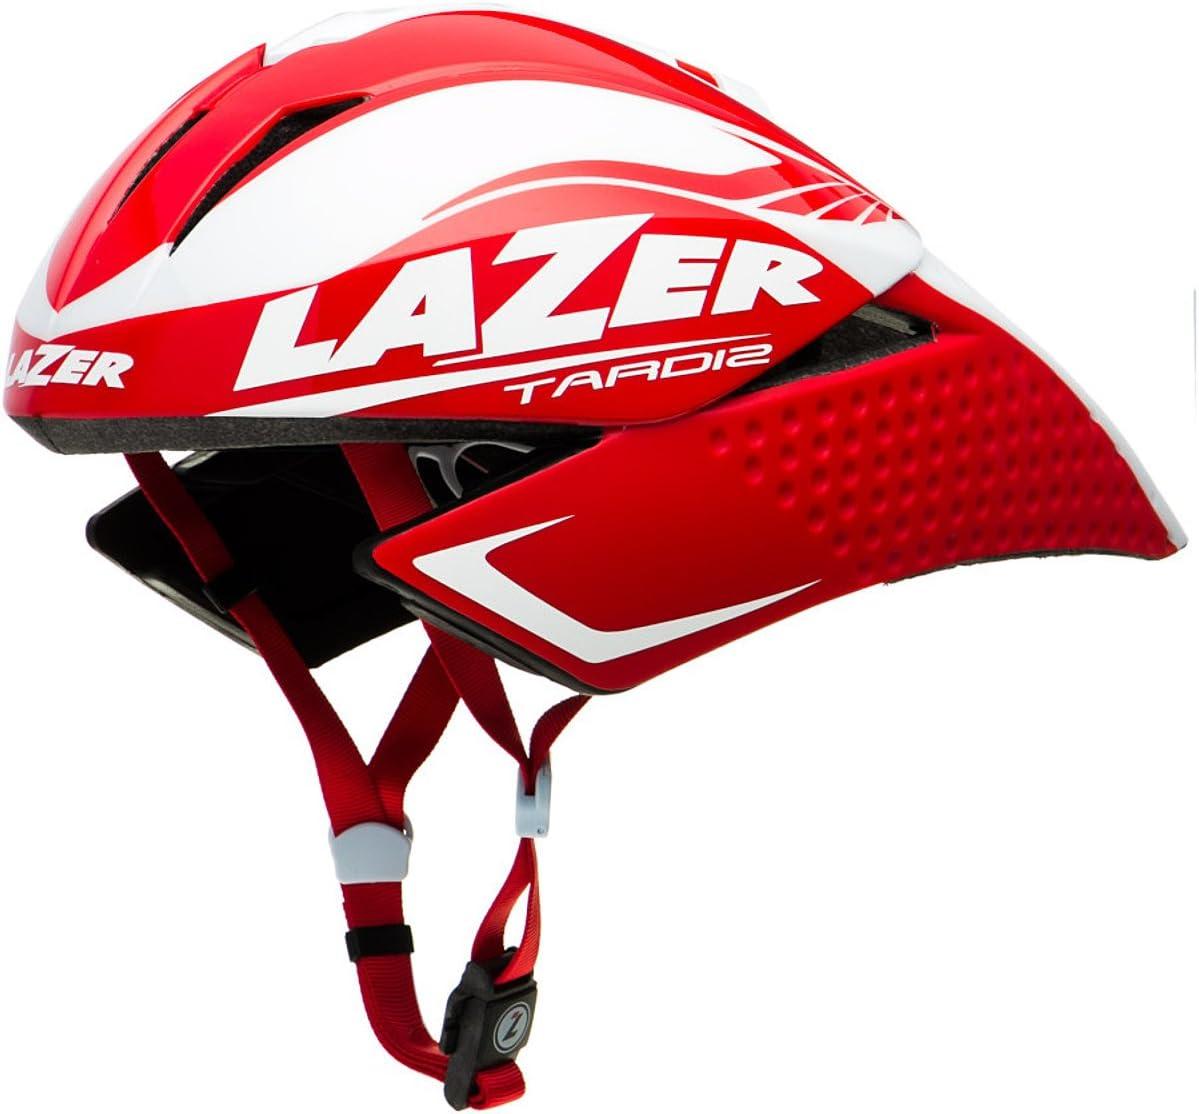 Lazer Tardiz Helmet